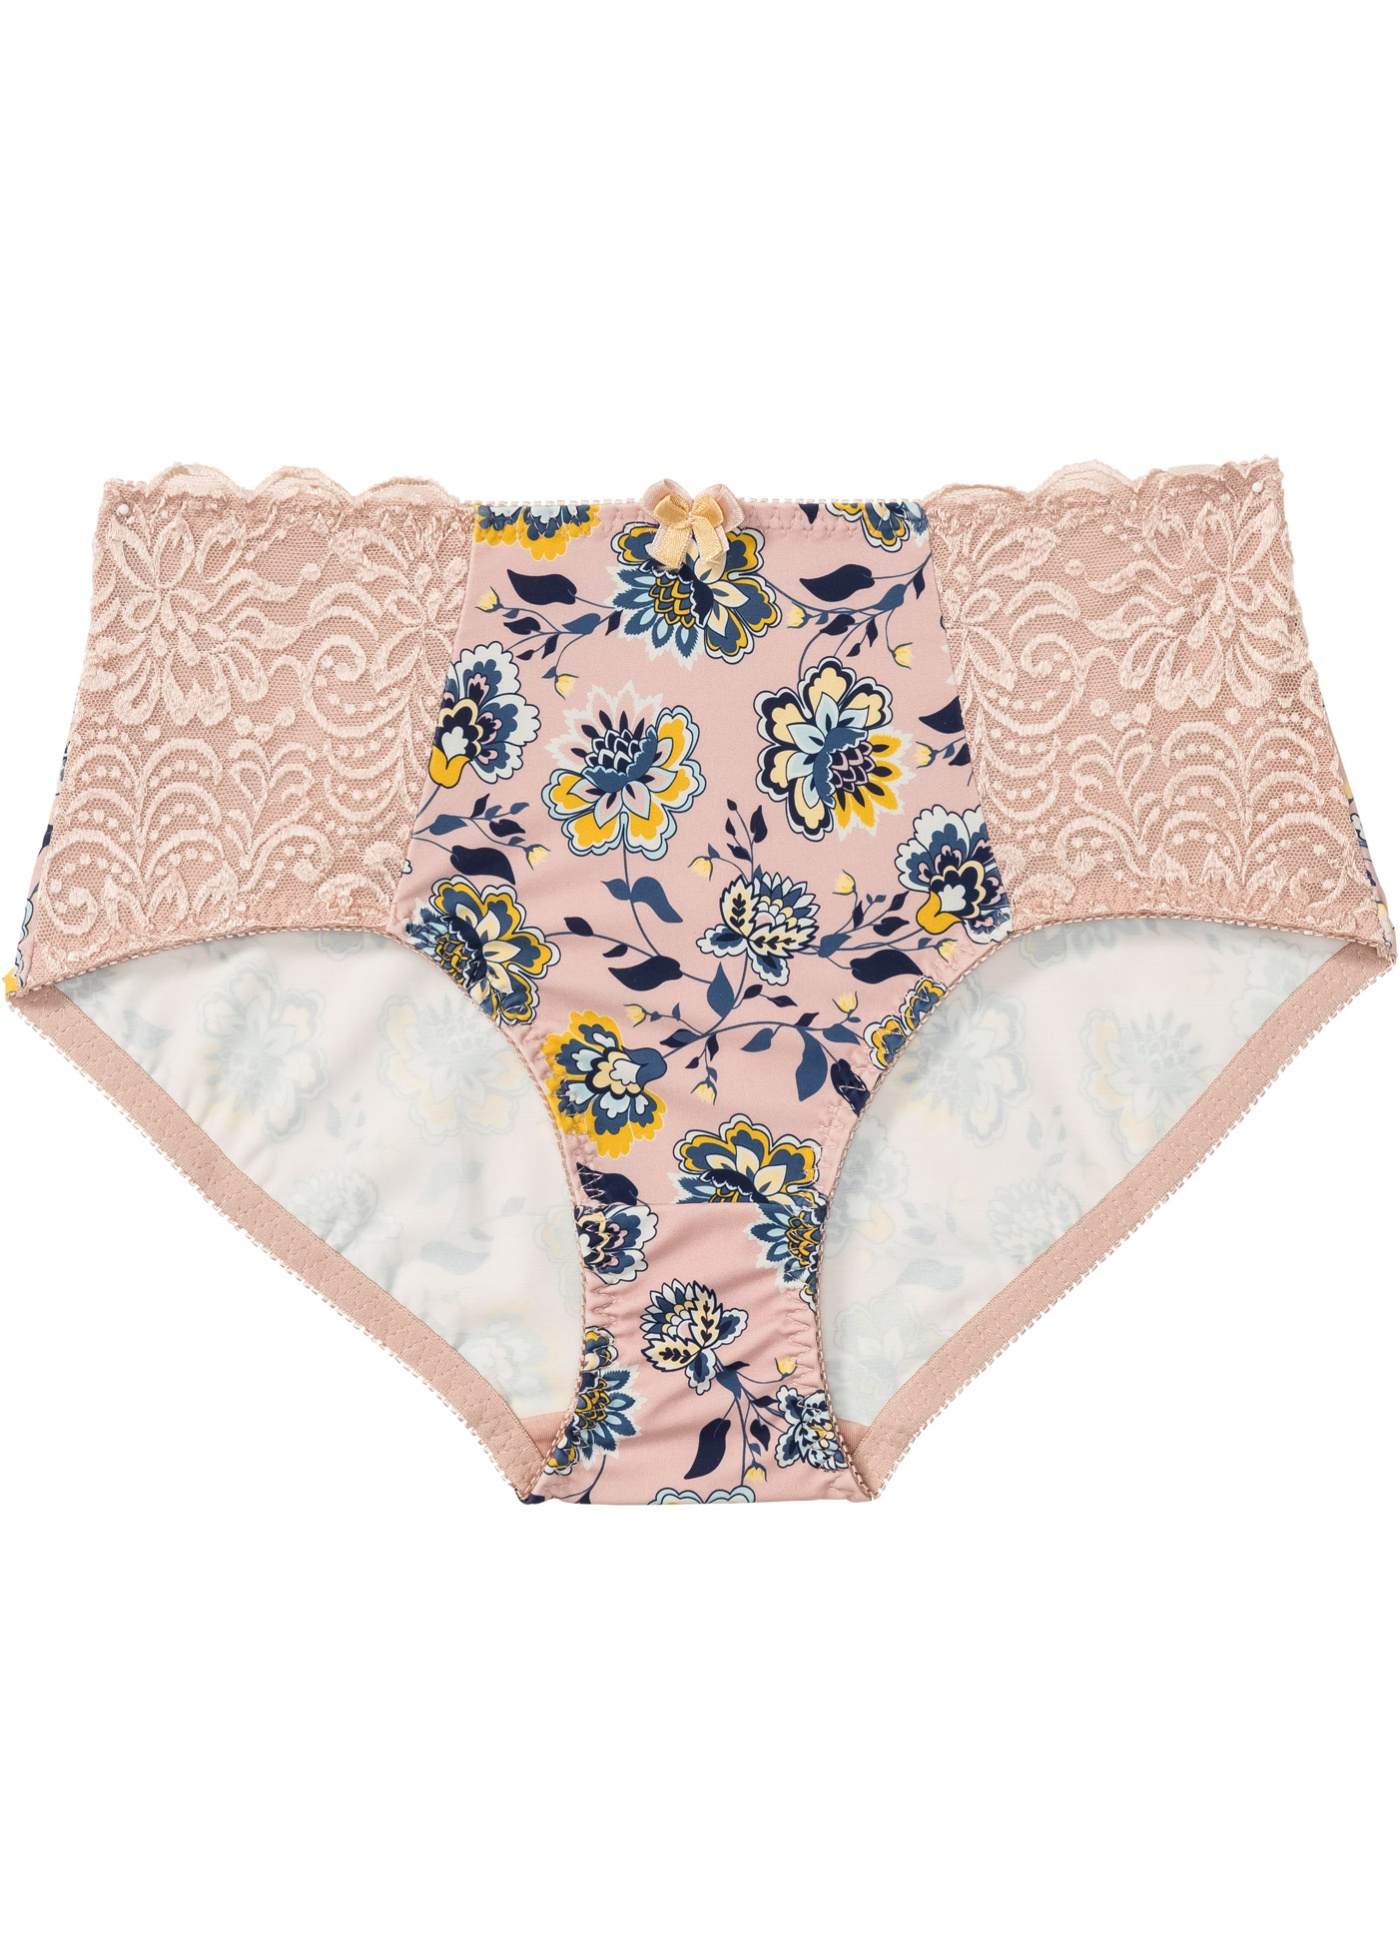 Femme Slip Bpc Pour Selection Rose BonprixMaxi Y7fvb6yg